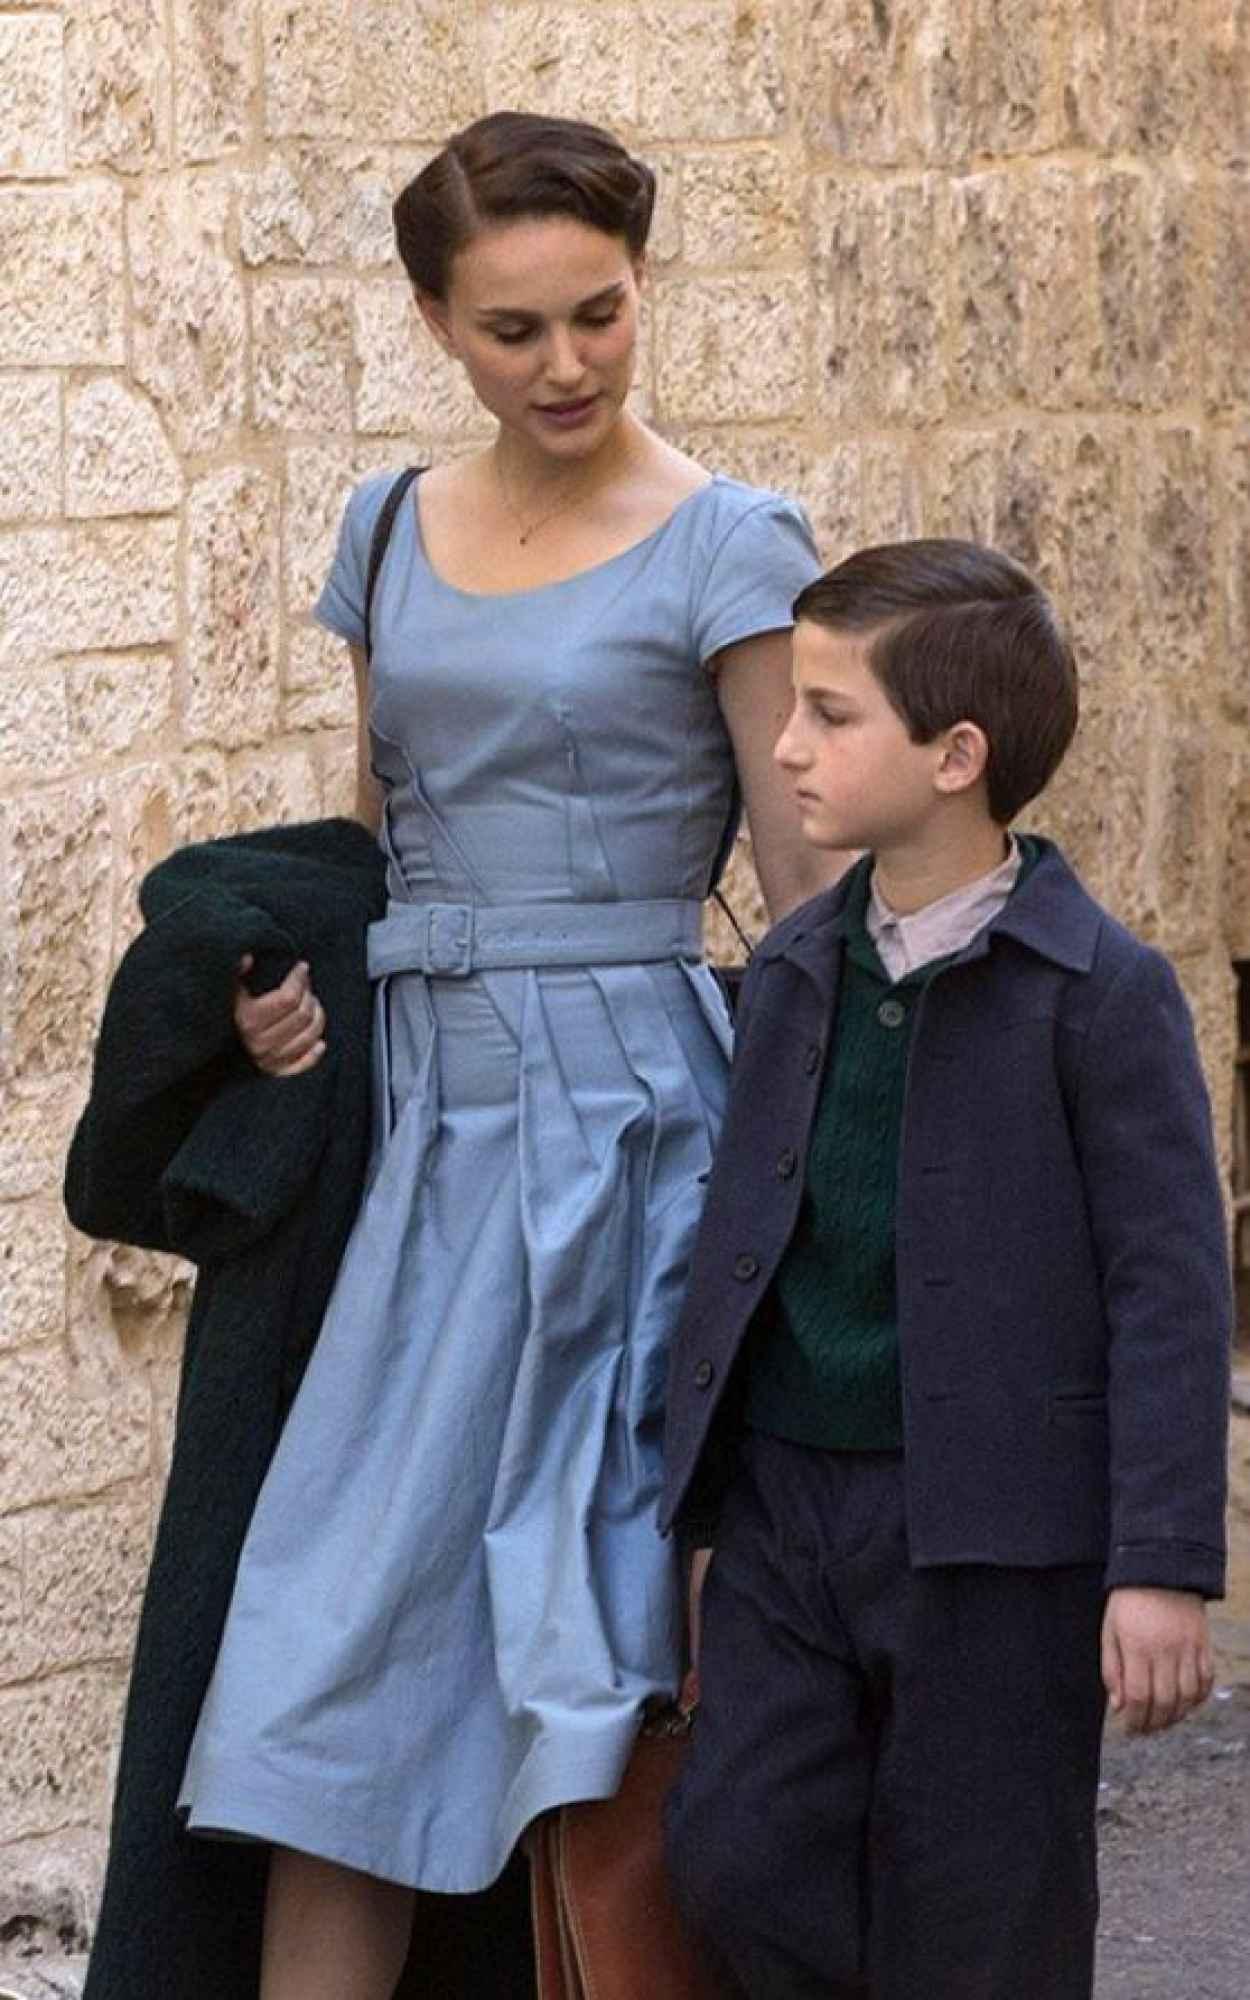 Natalie Portman - A Tale of Love and Darkness Set Photos - Jerusalem, February 2015-1